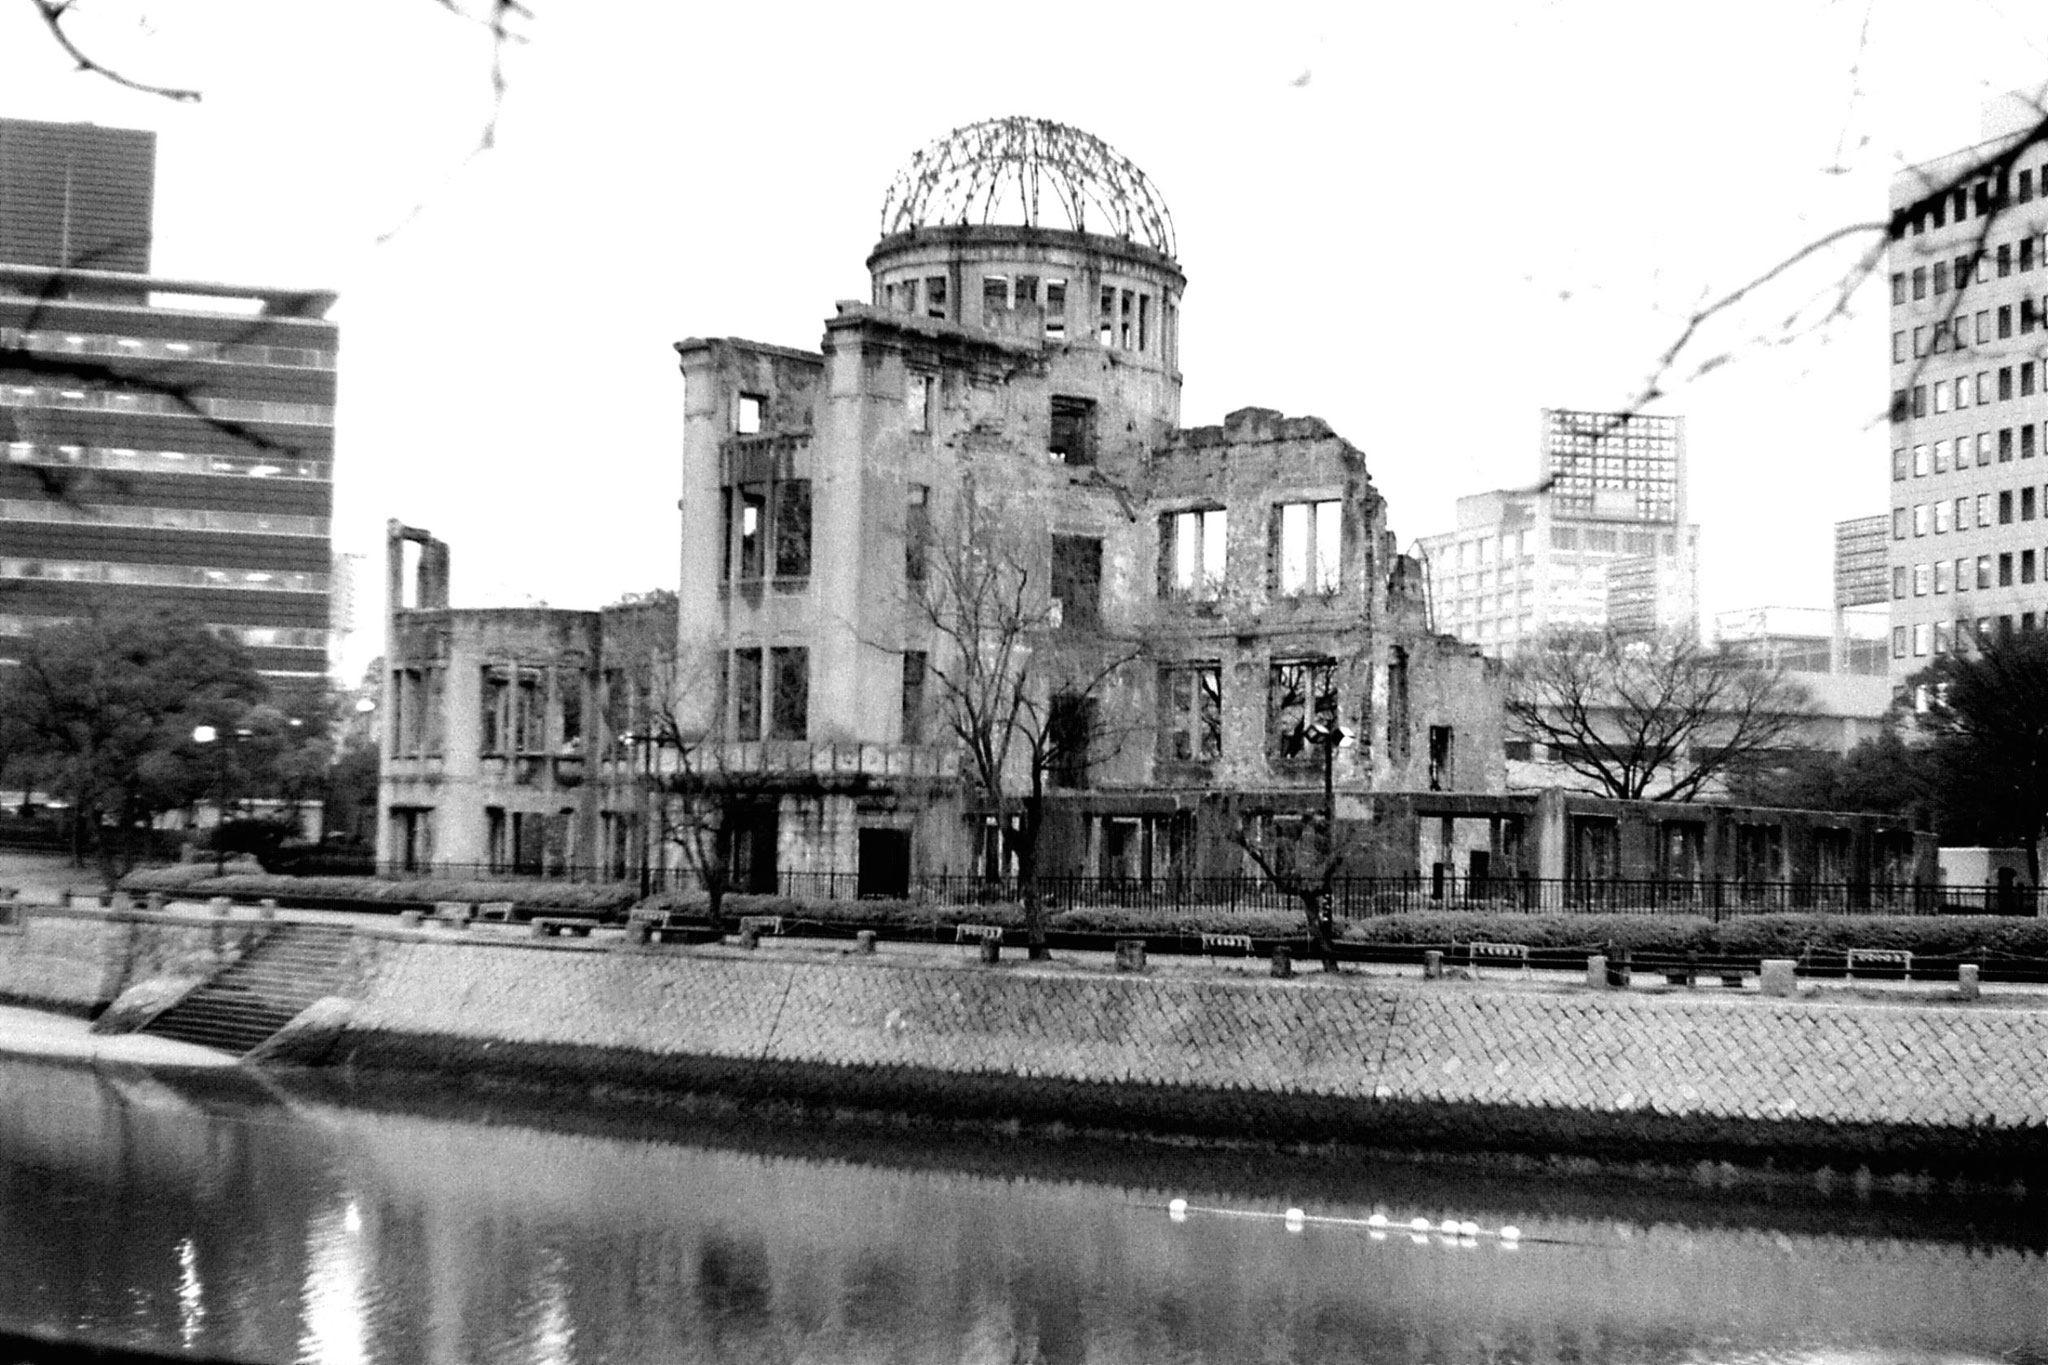 18/1/1989: 15: Hiroshima dome